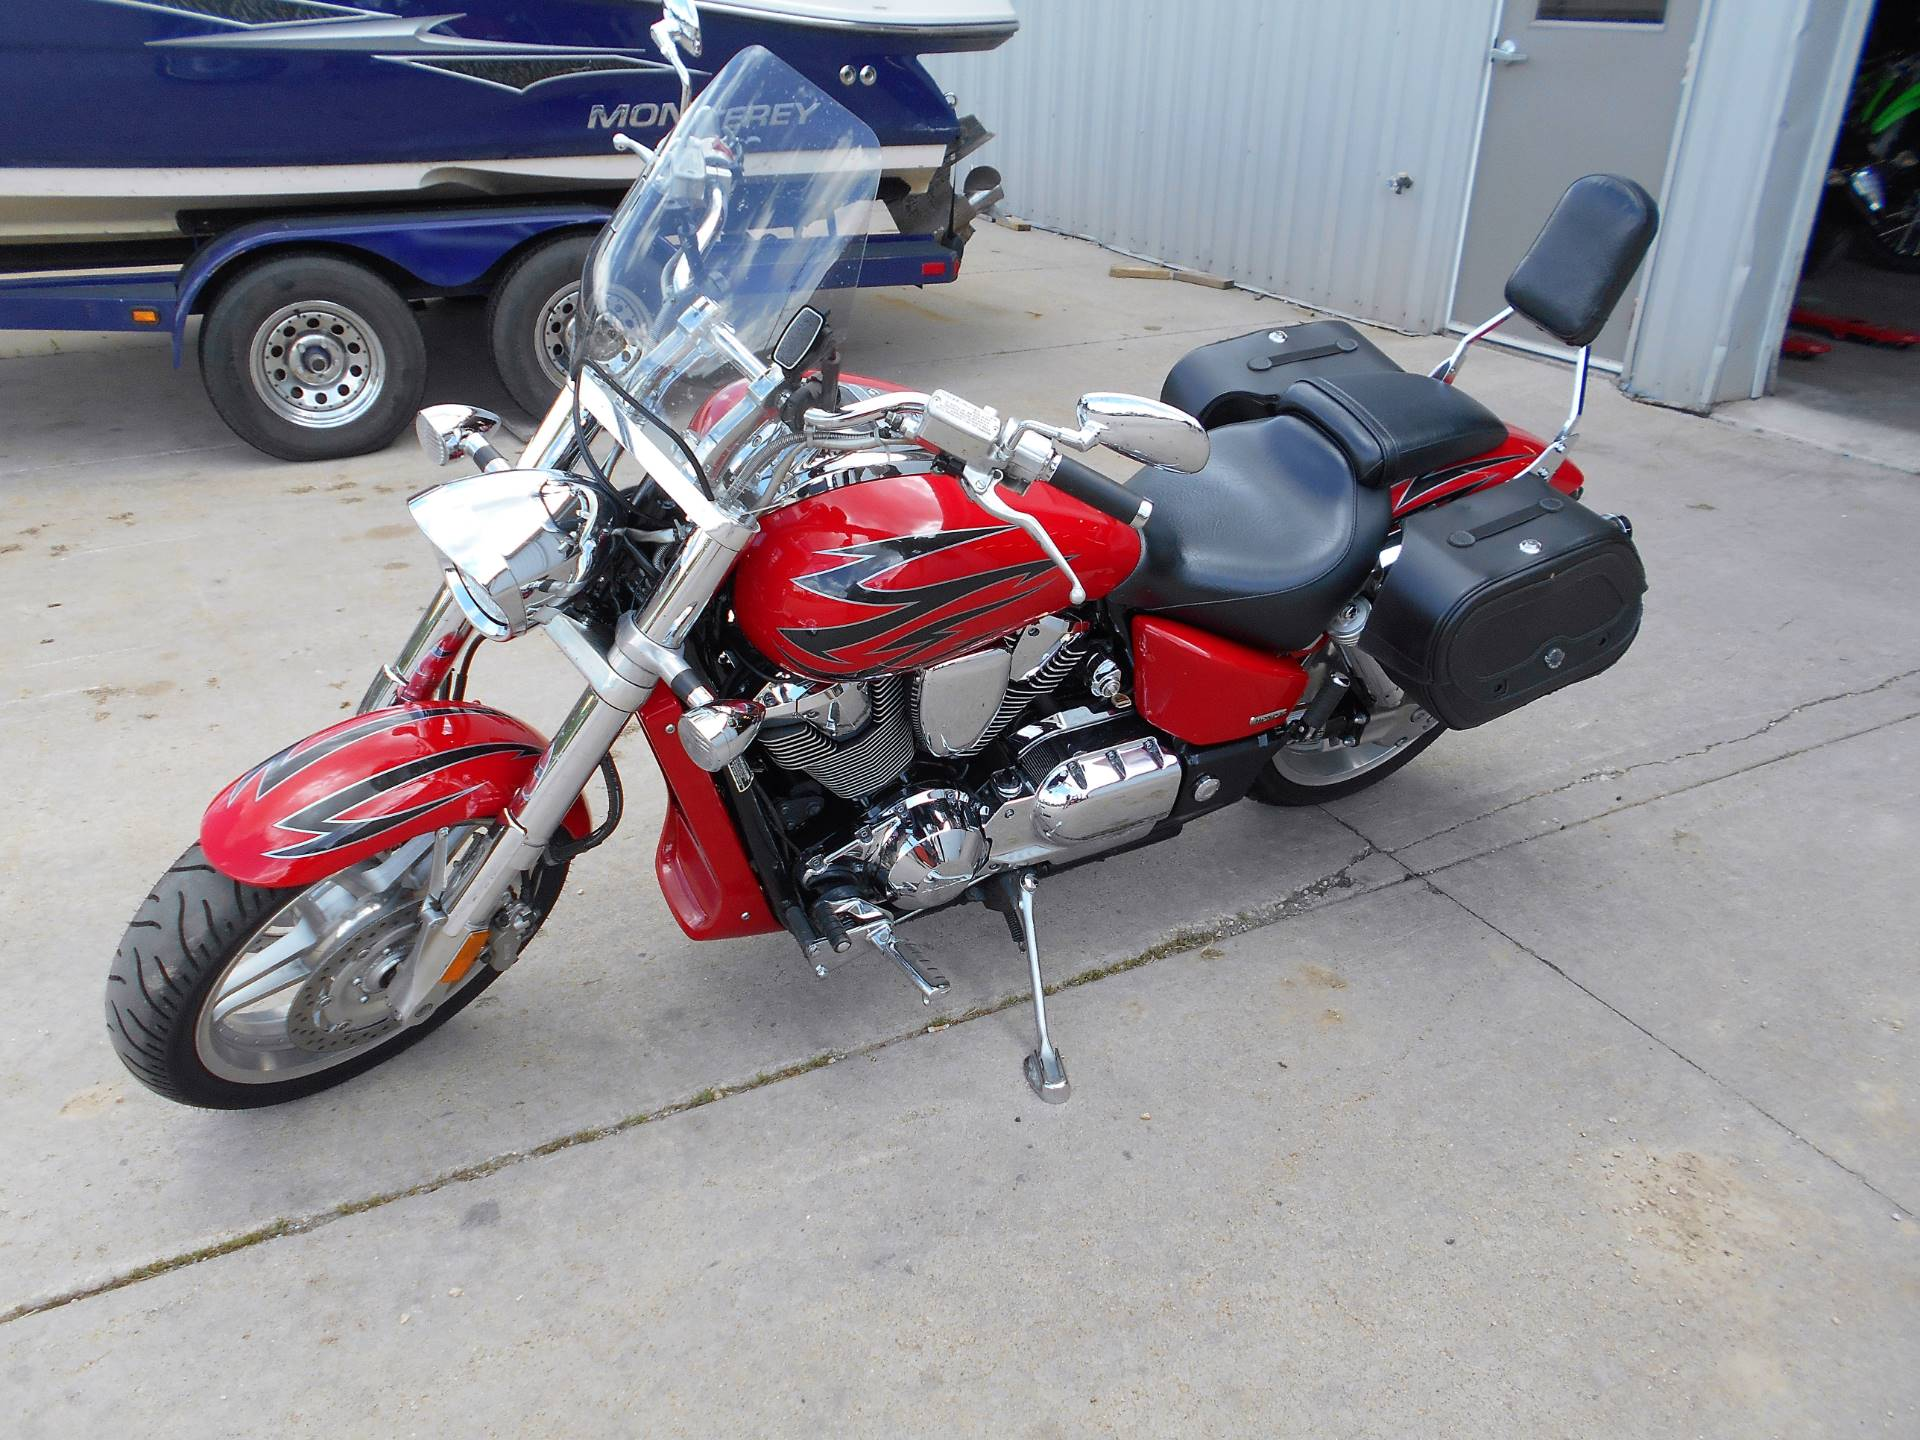 Used 2007 Honda VTX1800F Motorcycles in Belvidere, IL